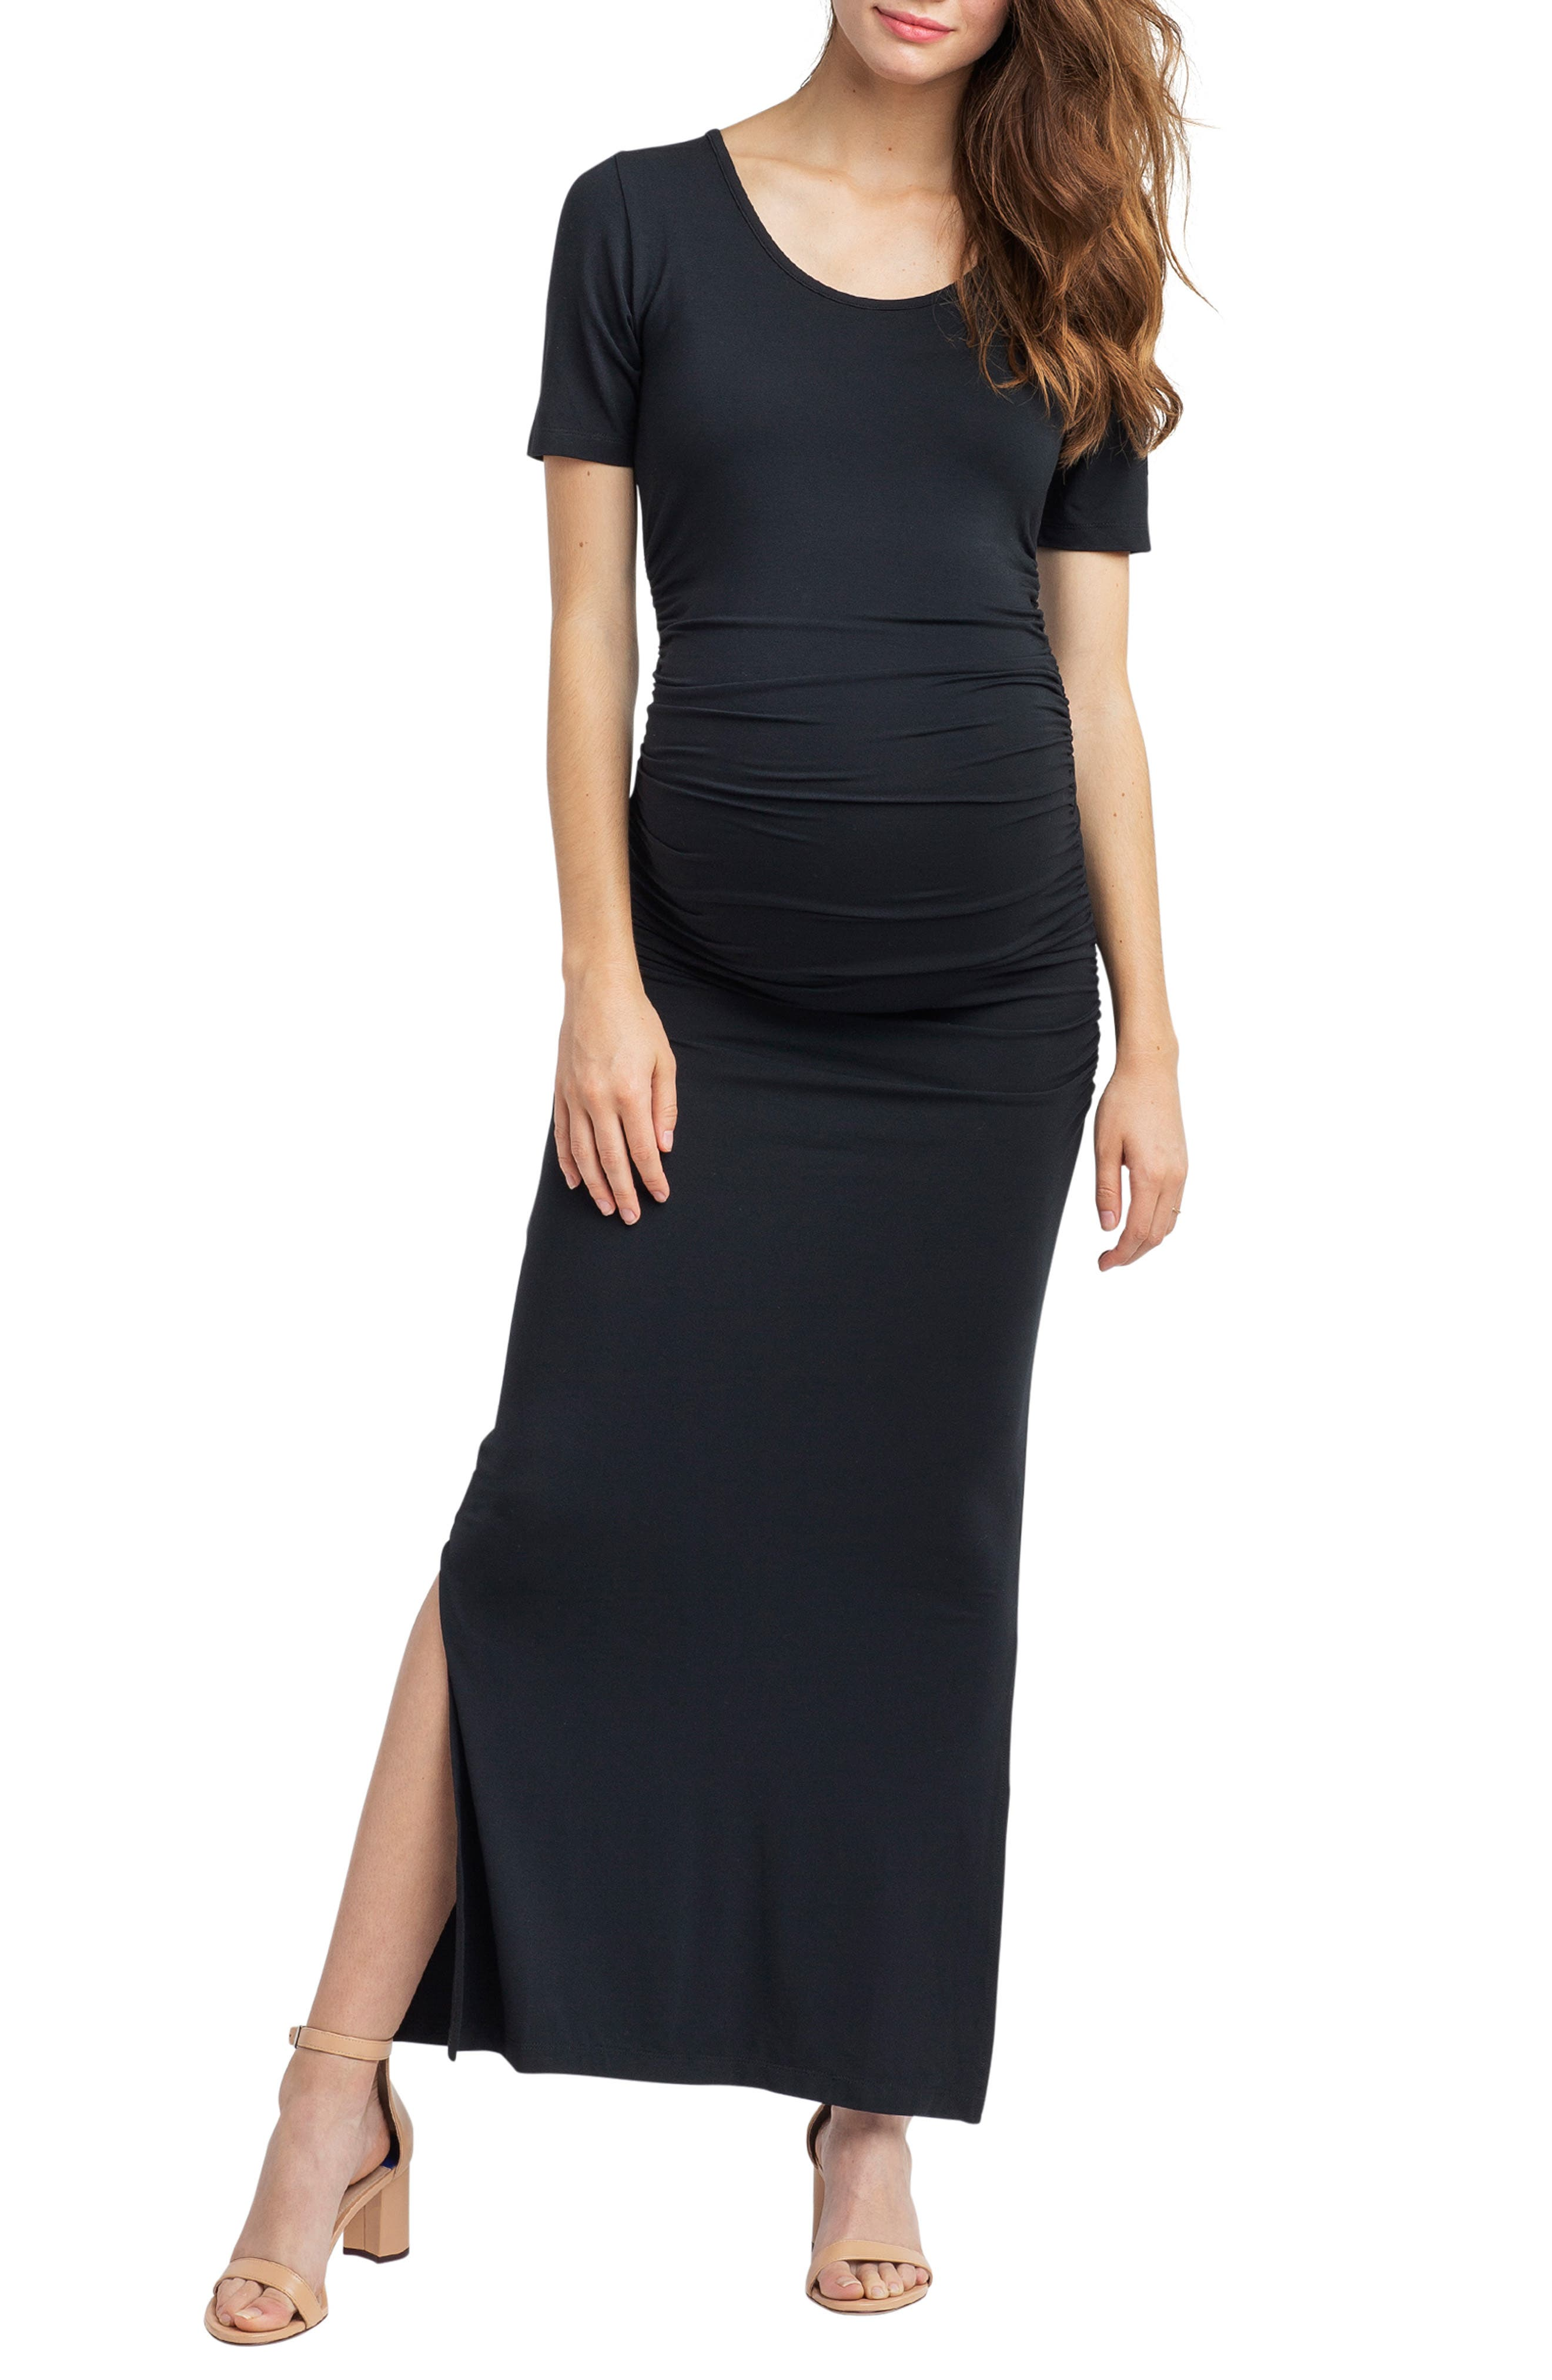 Nom Maternity Hugo Maxi Maternity Dress, Black